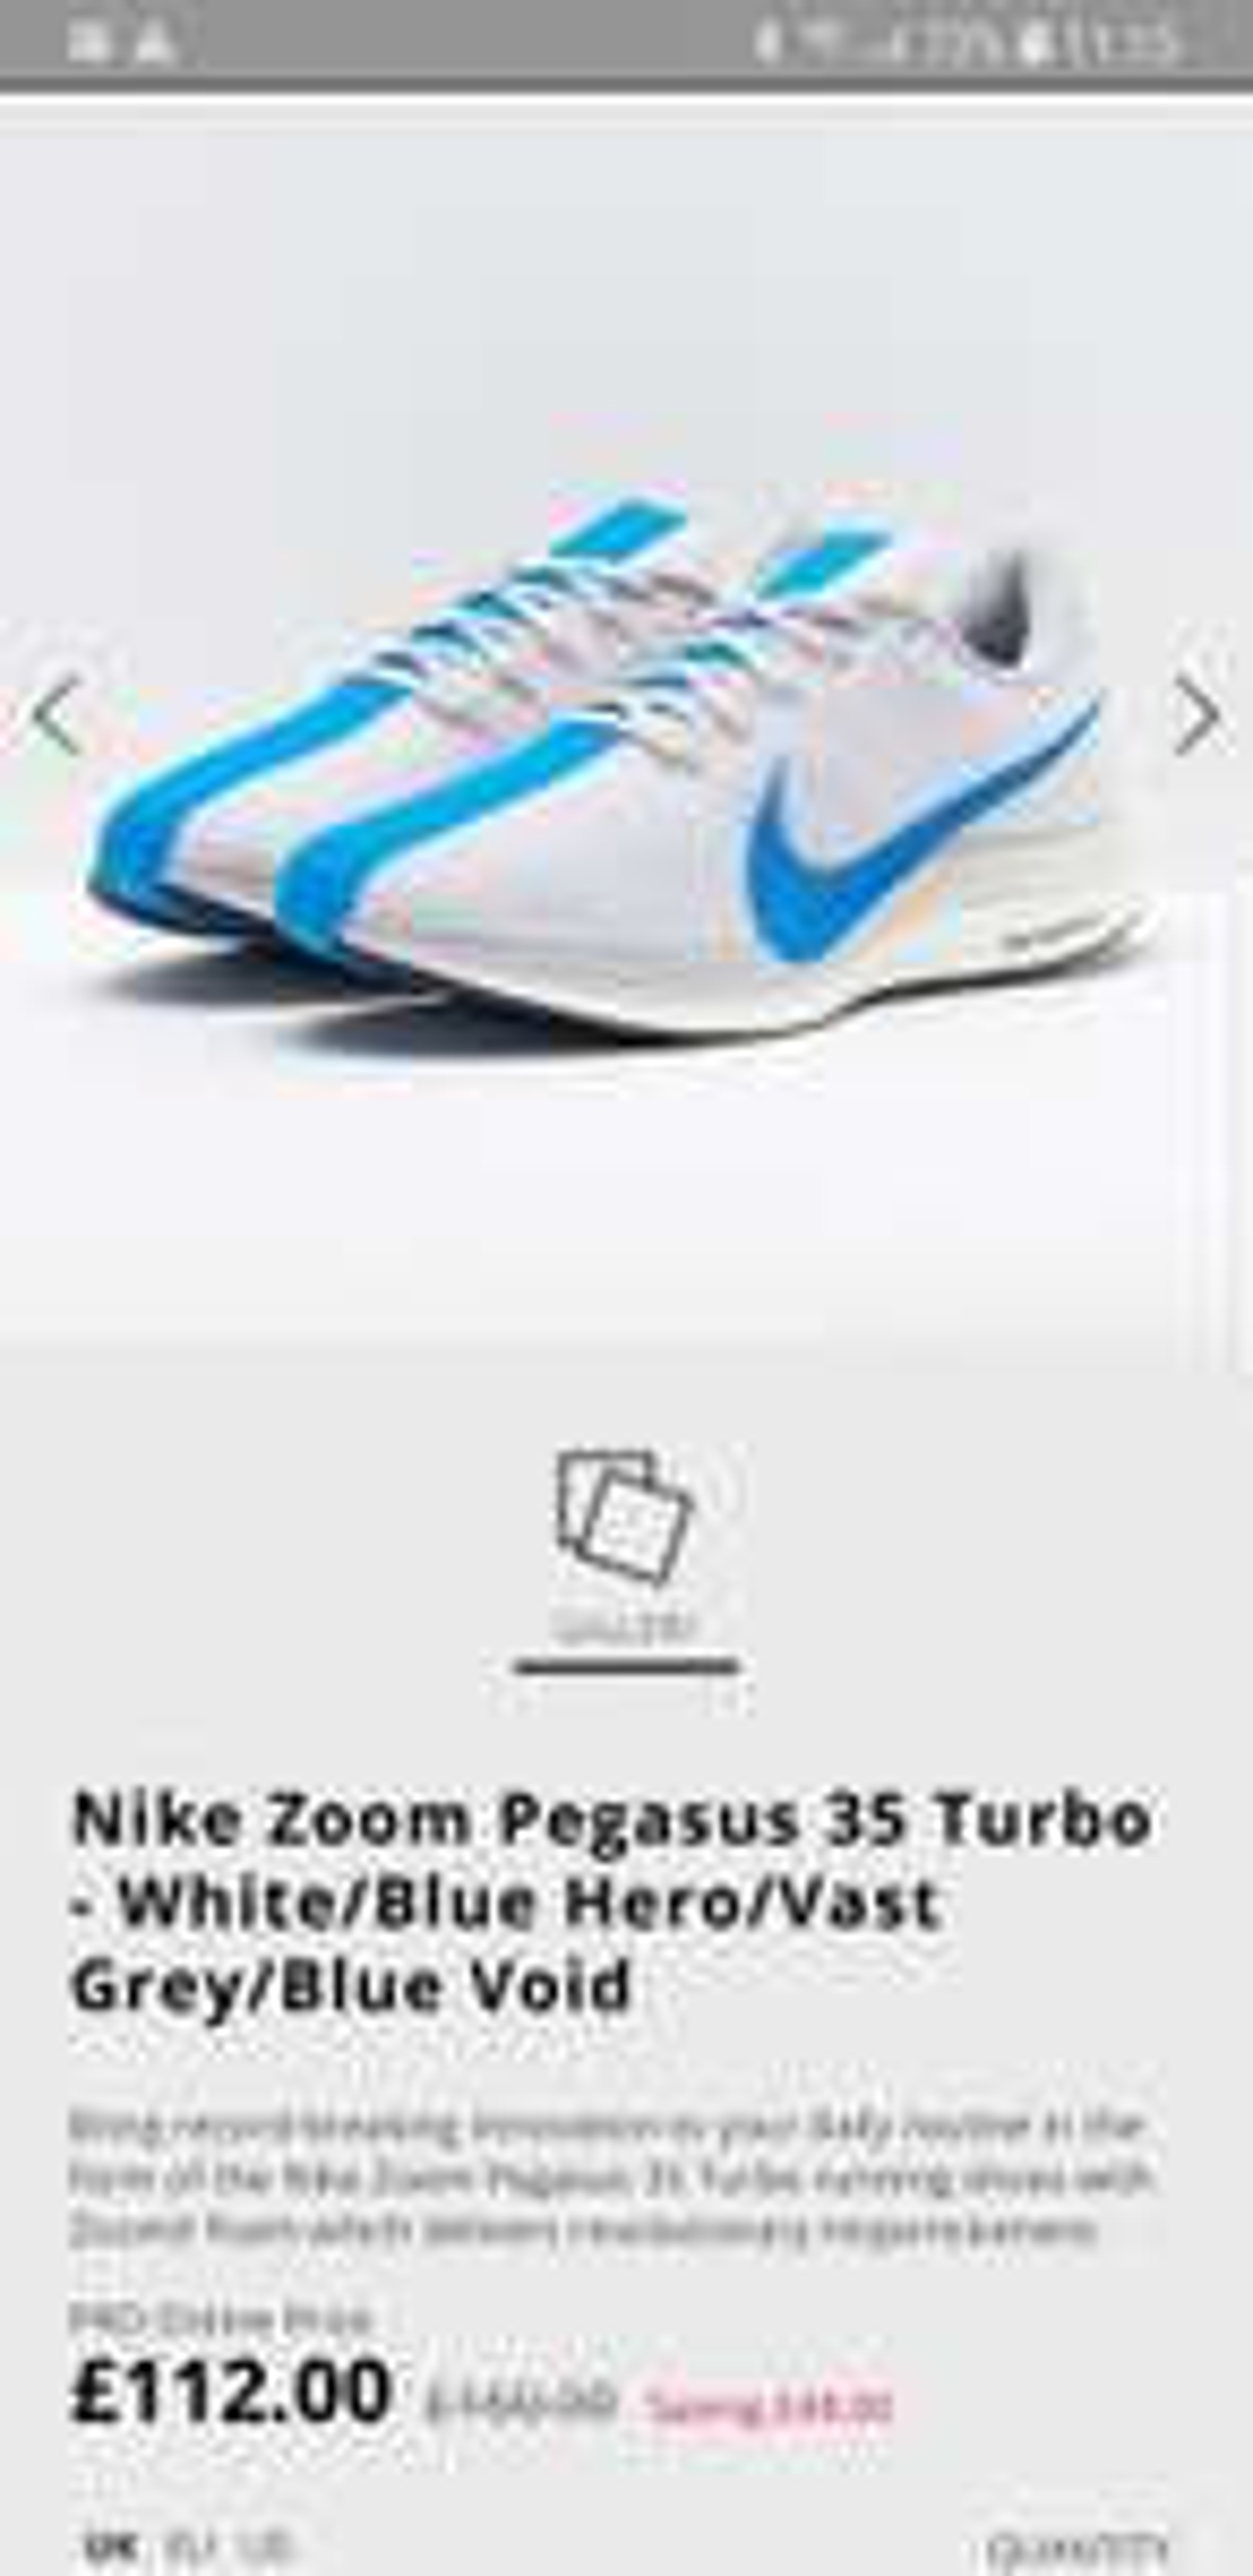 Nike Zoom Pegasus 35 Turbo at ProDirect Running for £112